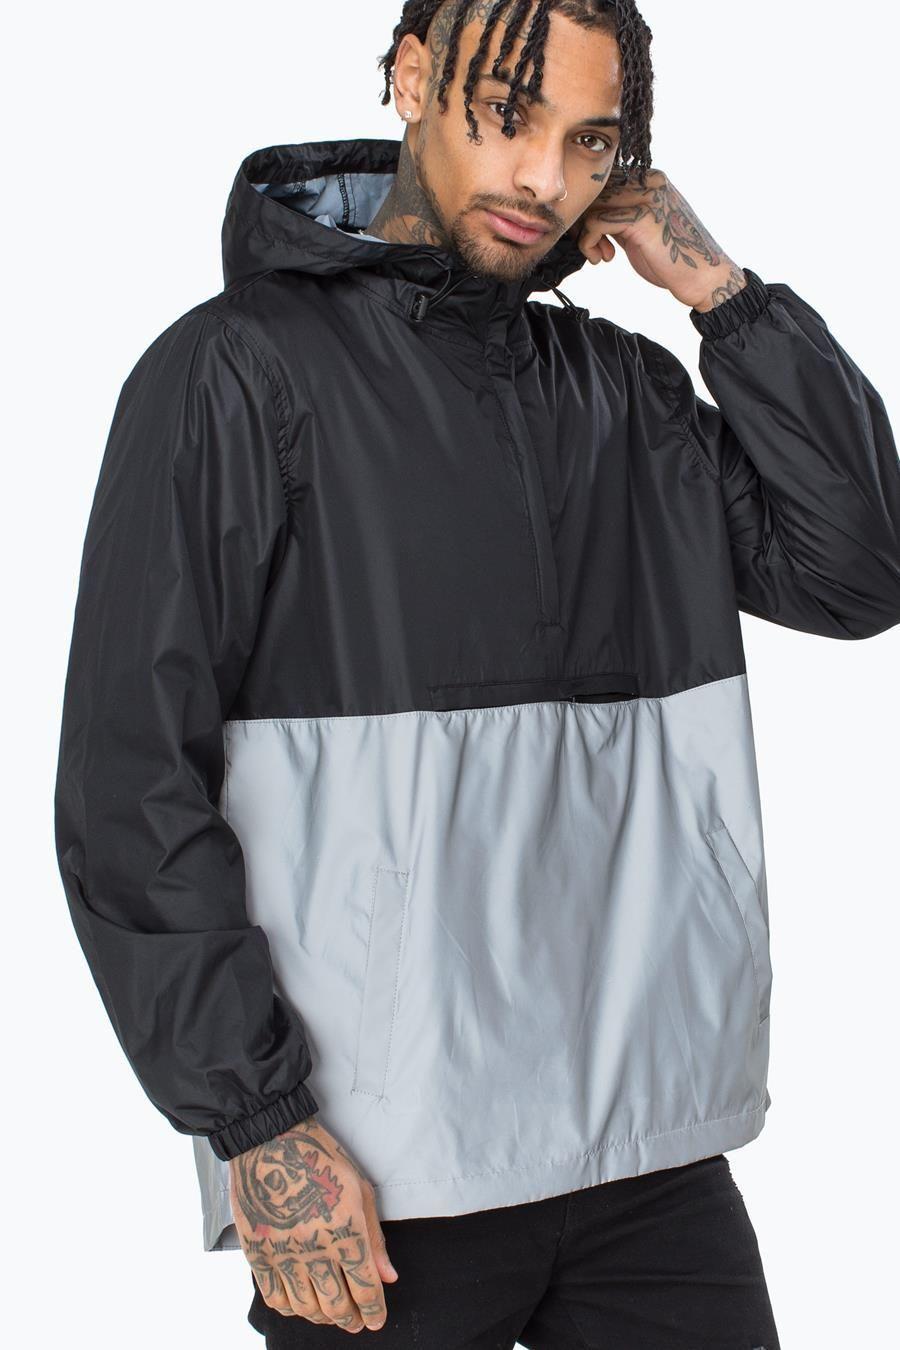 Hype Black Insignia Reflective Mens Pullover Jacket